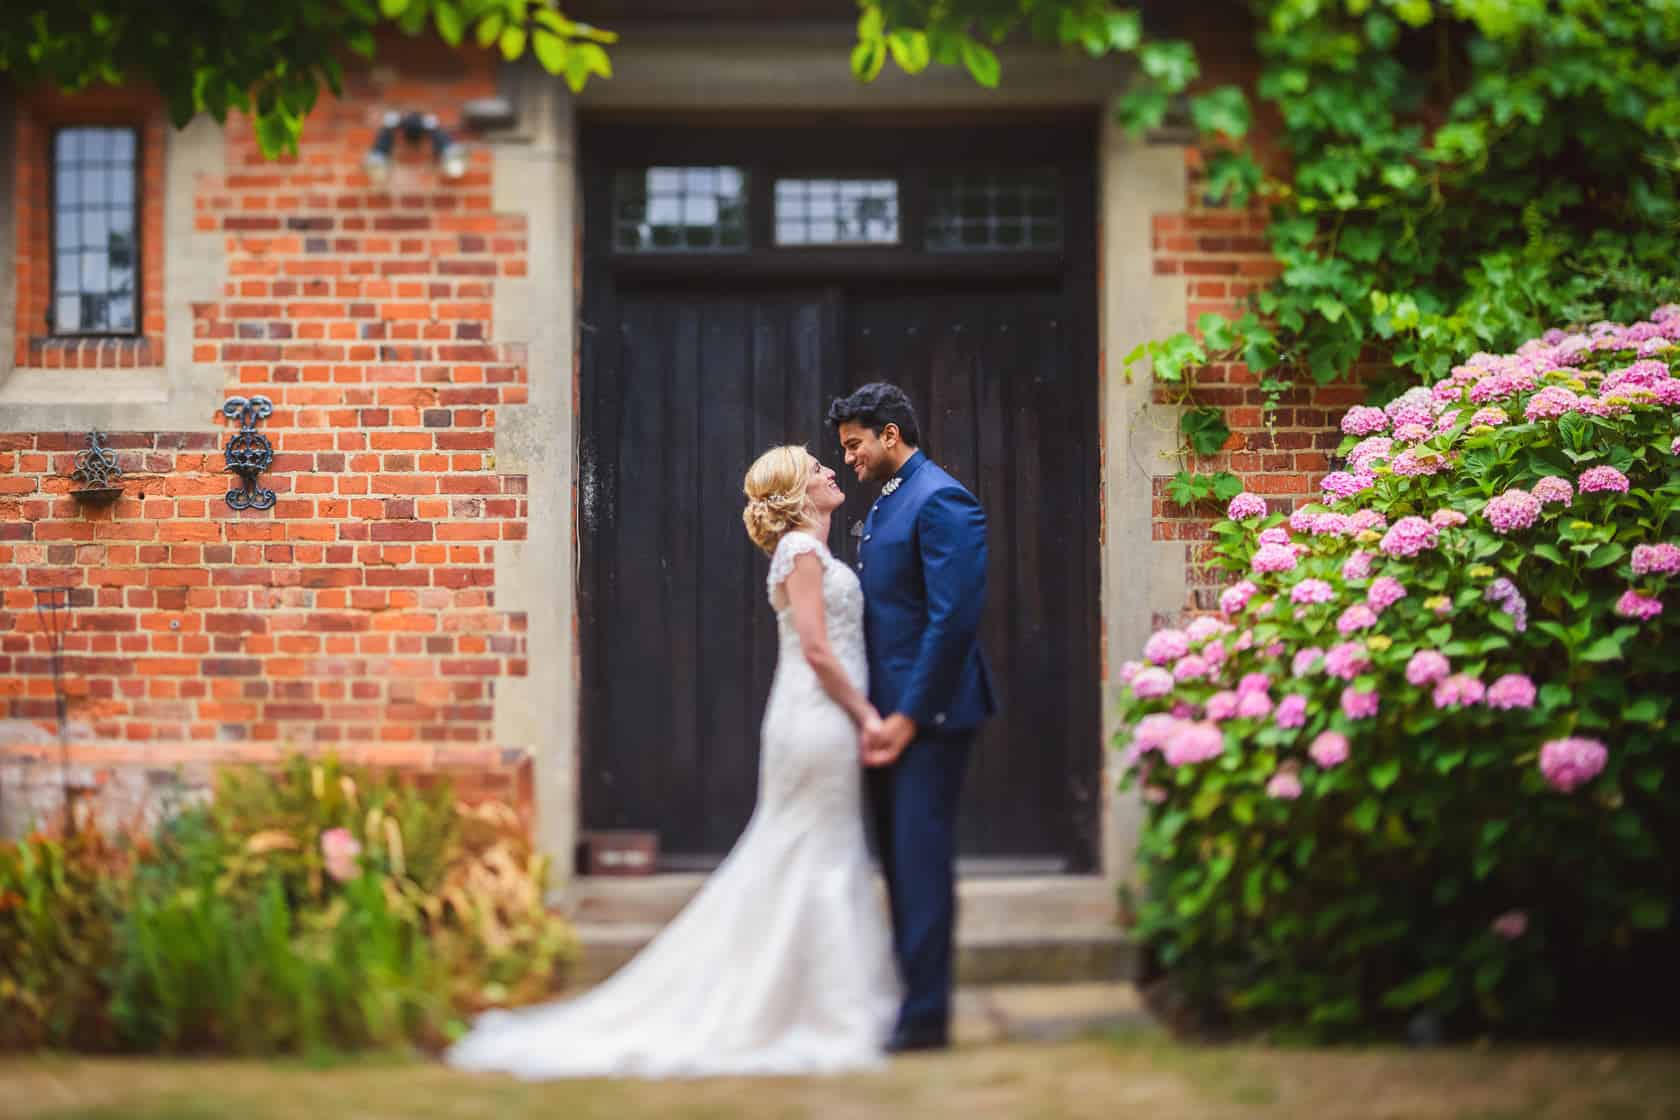 Best_Wedding_Photography_2018_Wedding-Photographer-Essex-and-London_038